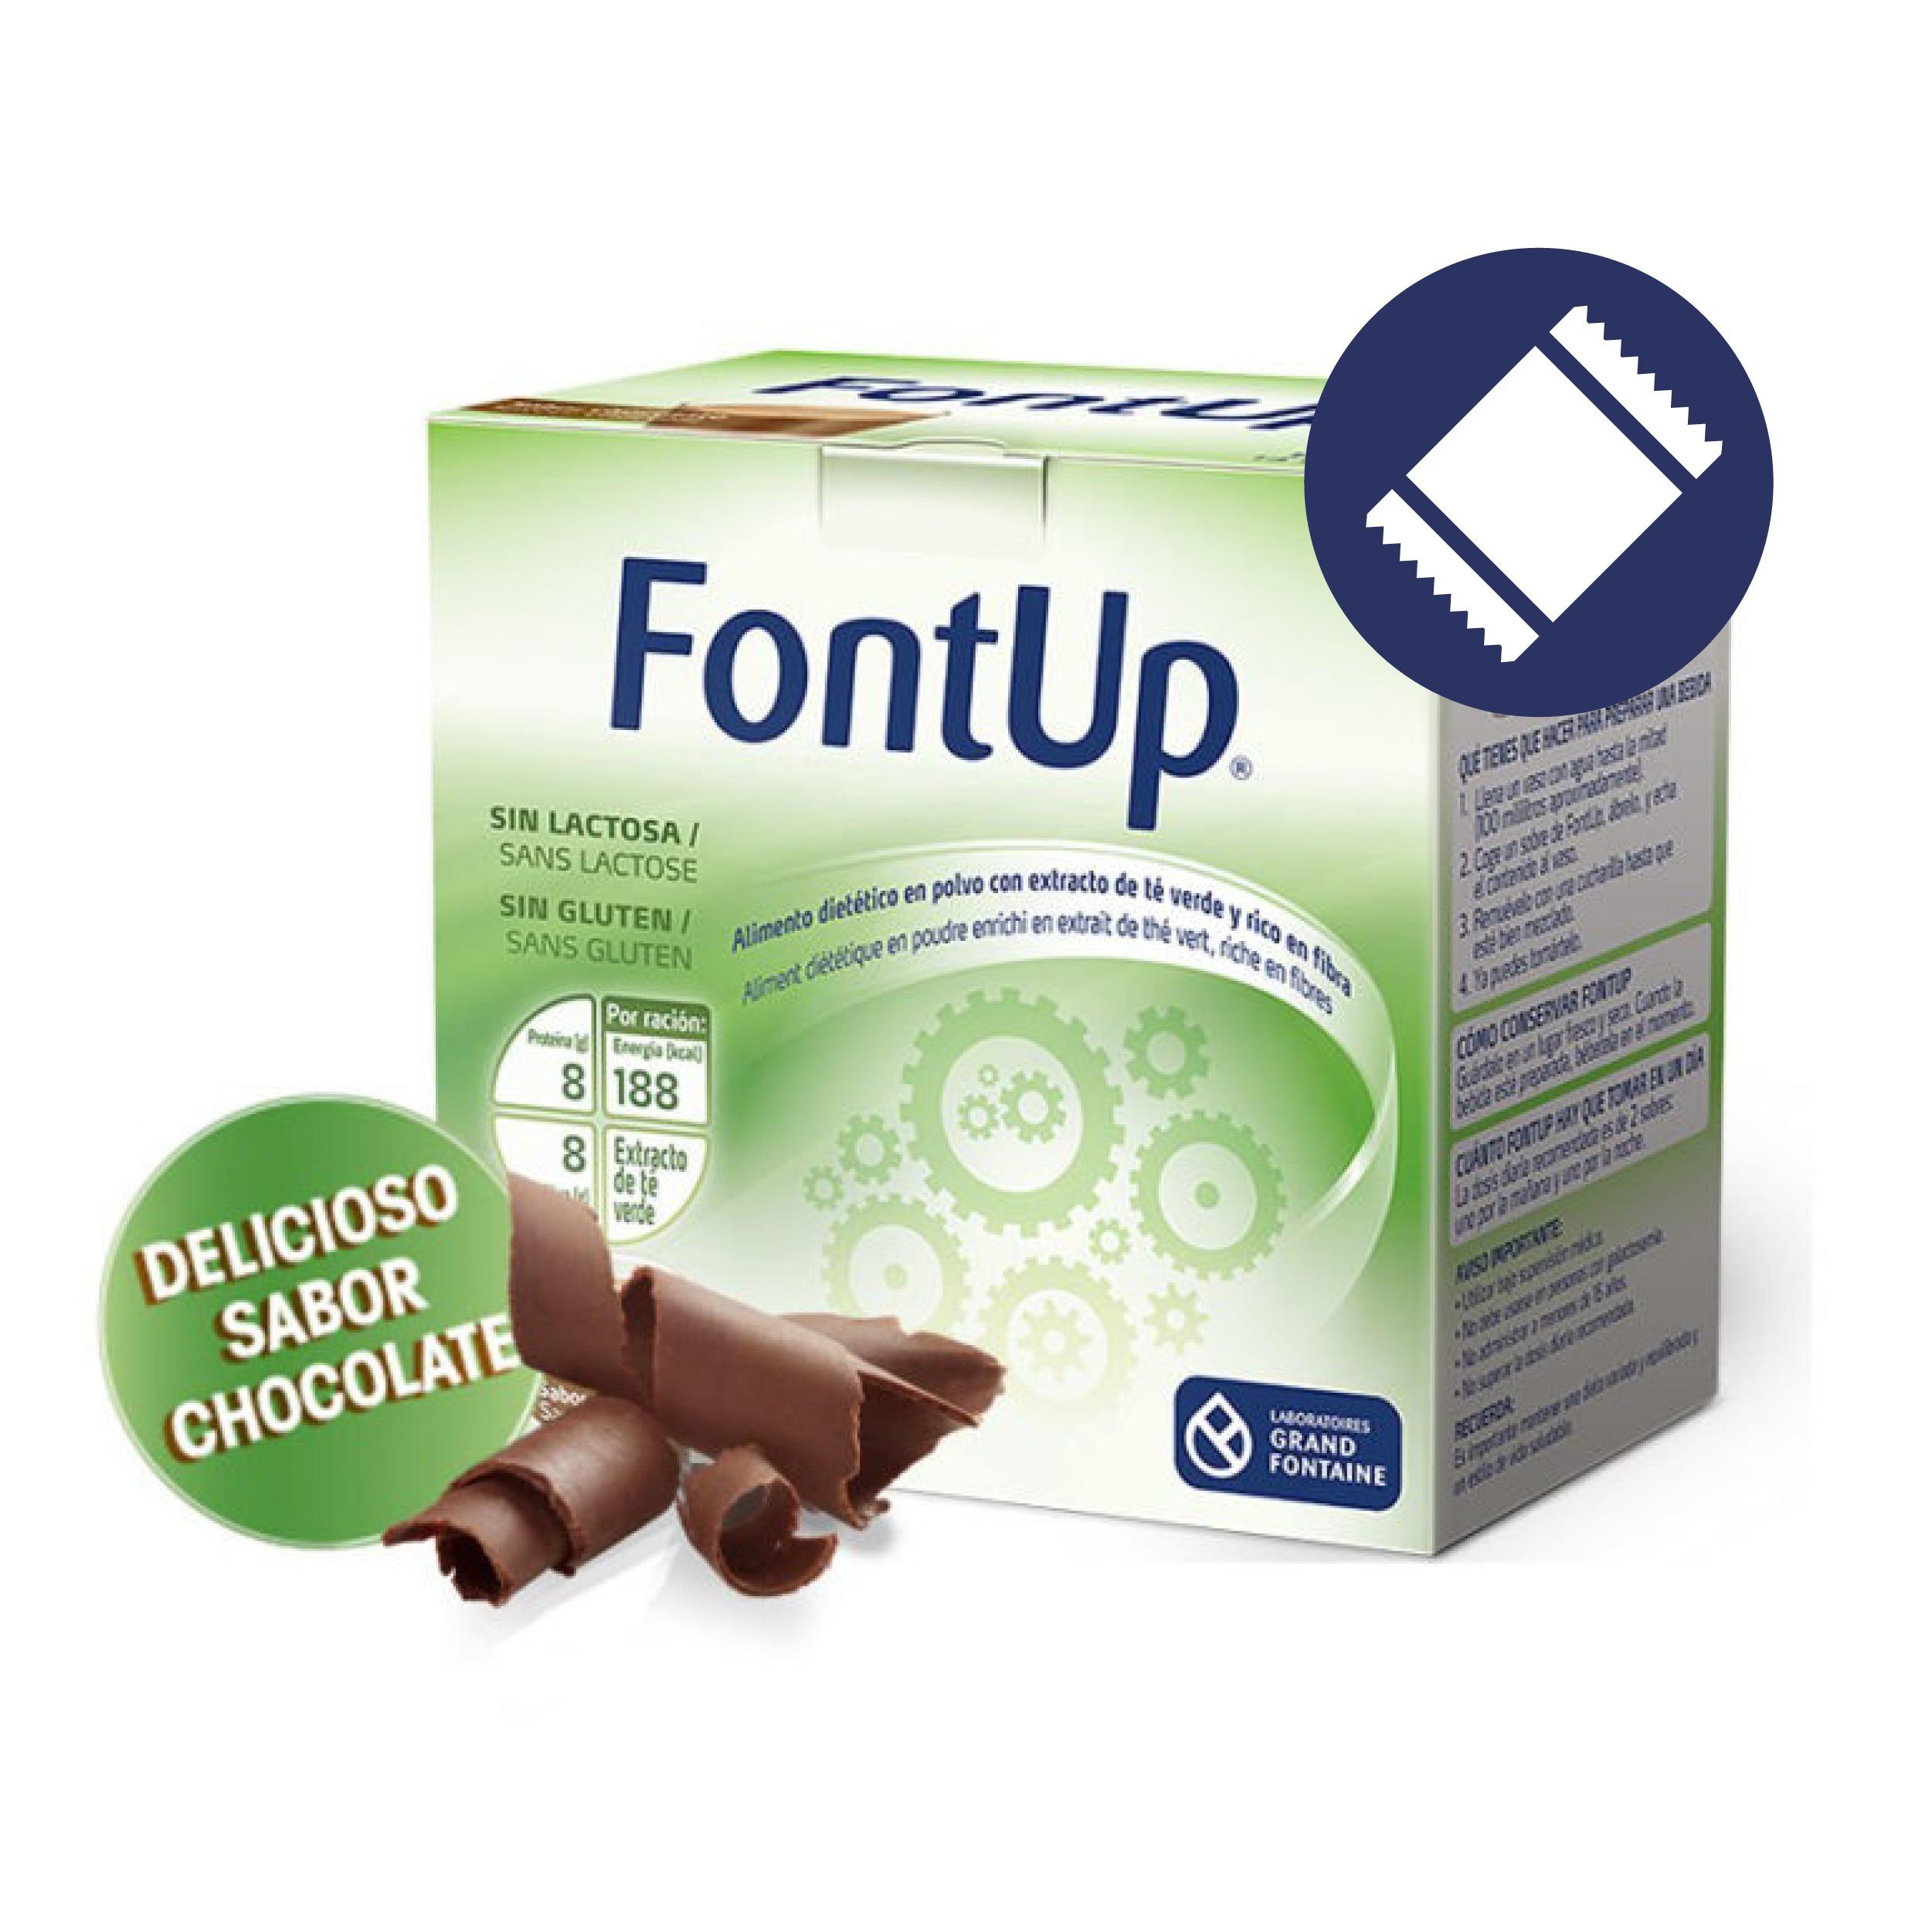 FontUp Chocolate<br>1 UNIDAD